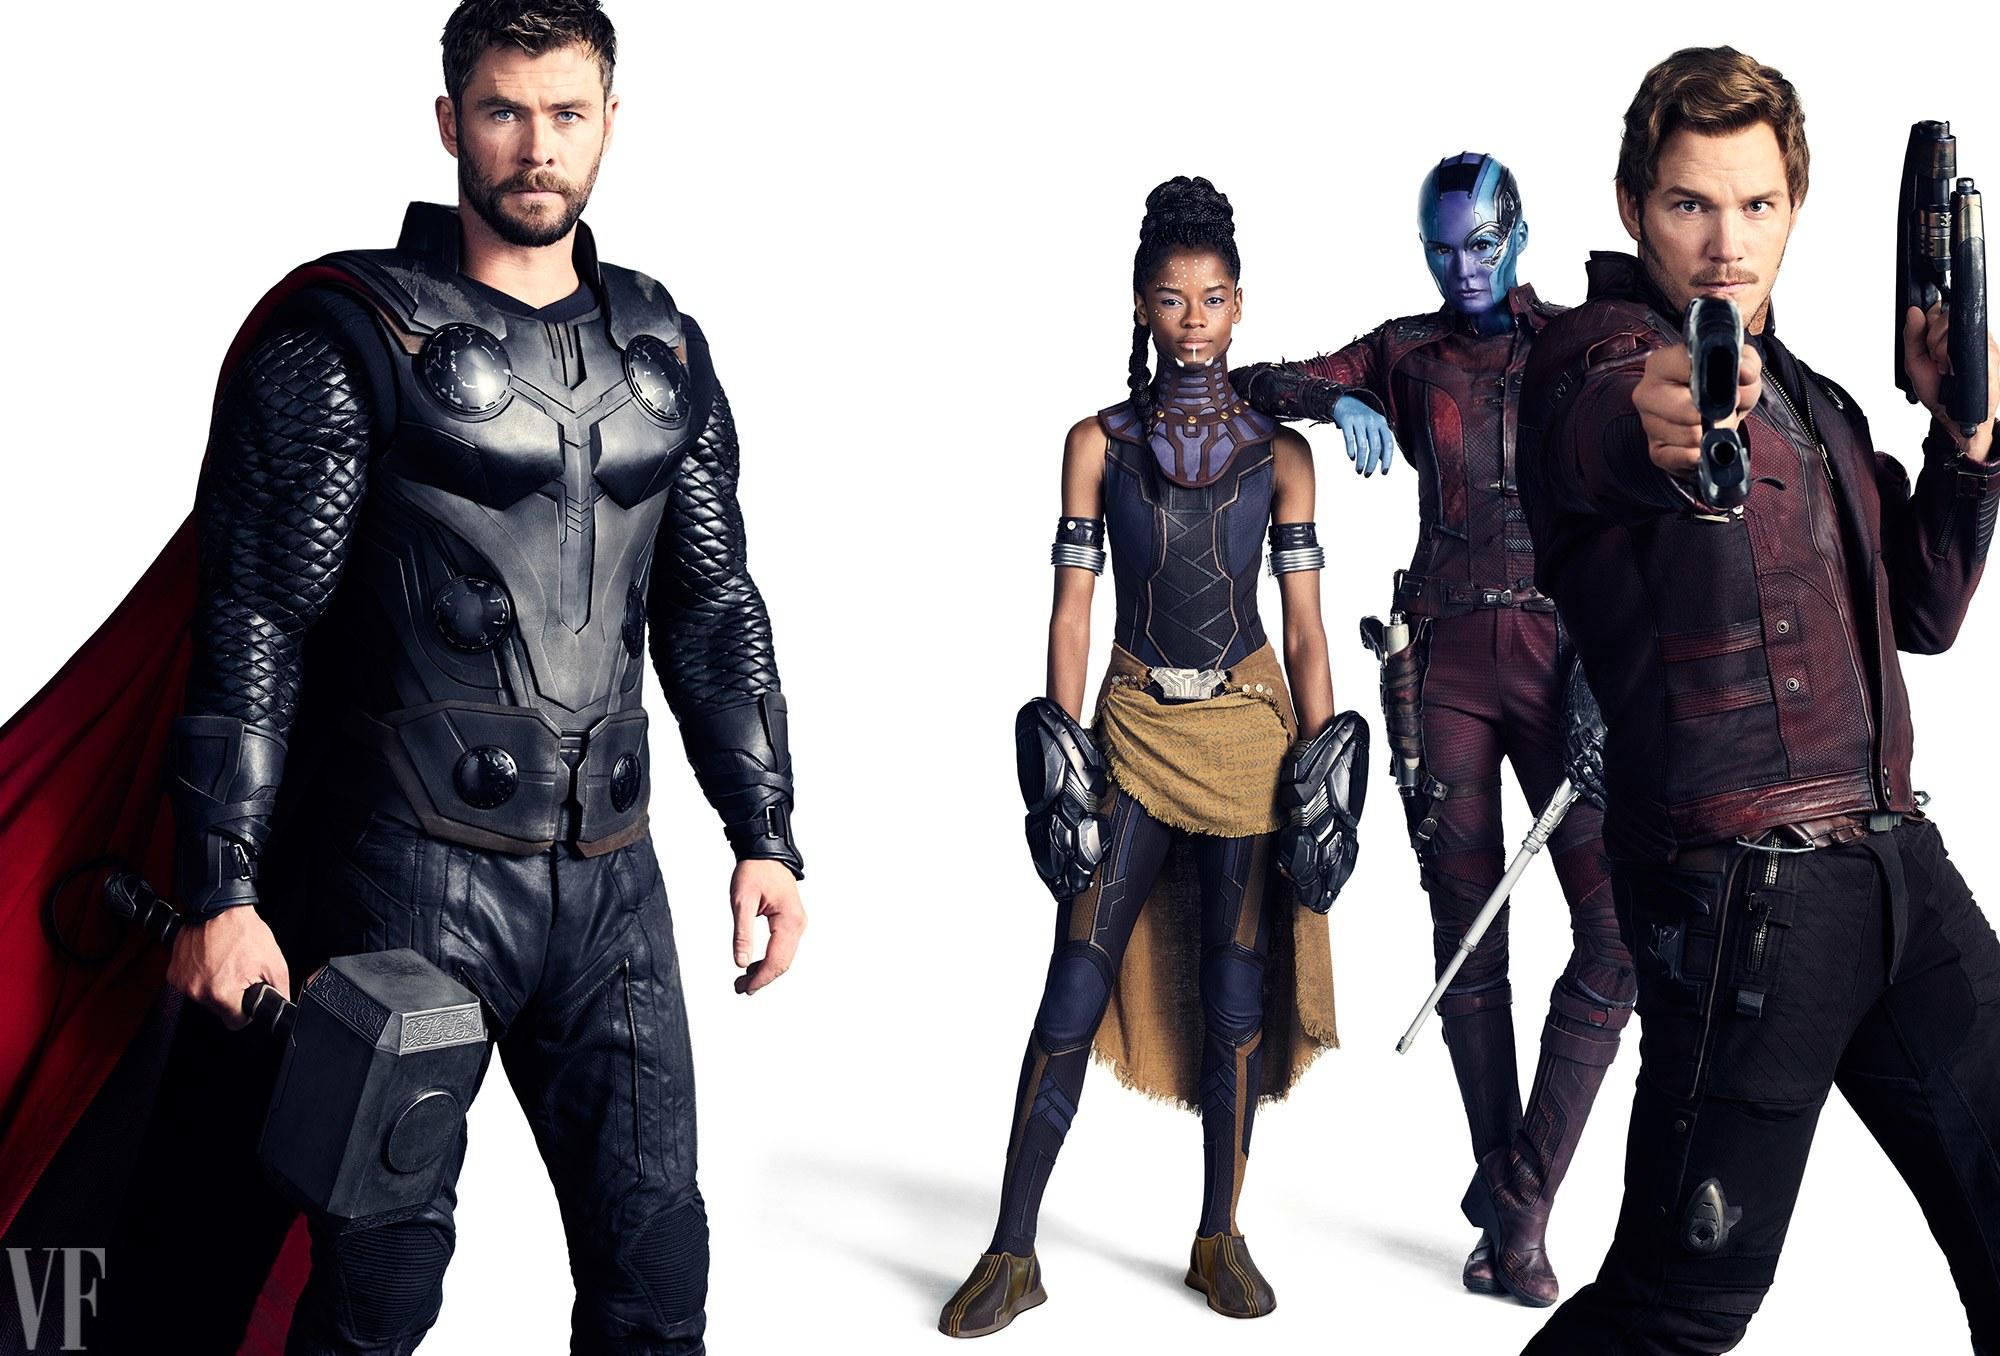 Chris Hemsworth, mint Thor, Letitia Wright, mint Shuri, Karen Gillan, mint Nebula és Chris Pratt, mint Űrlord